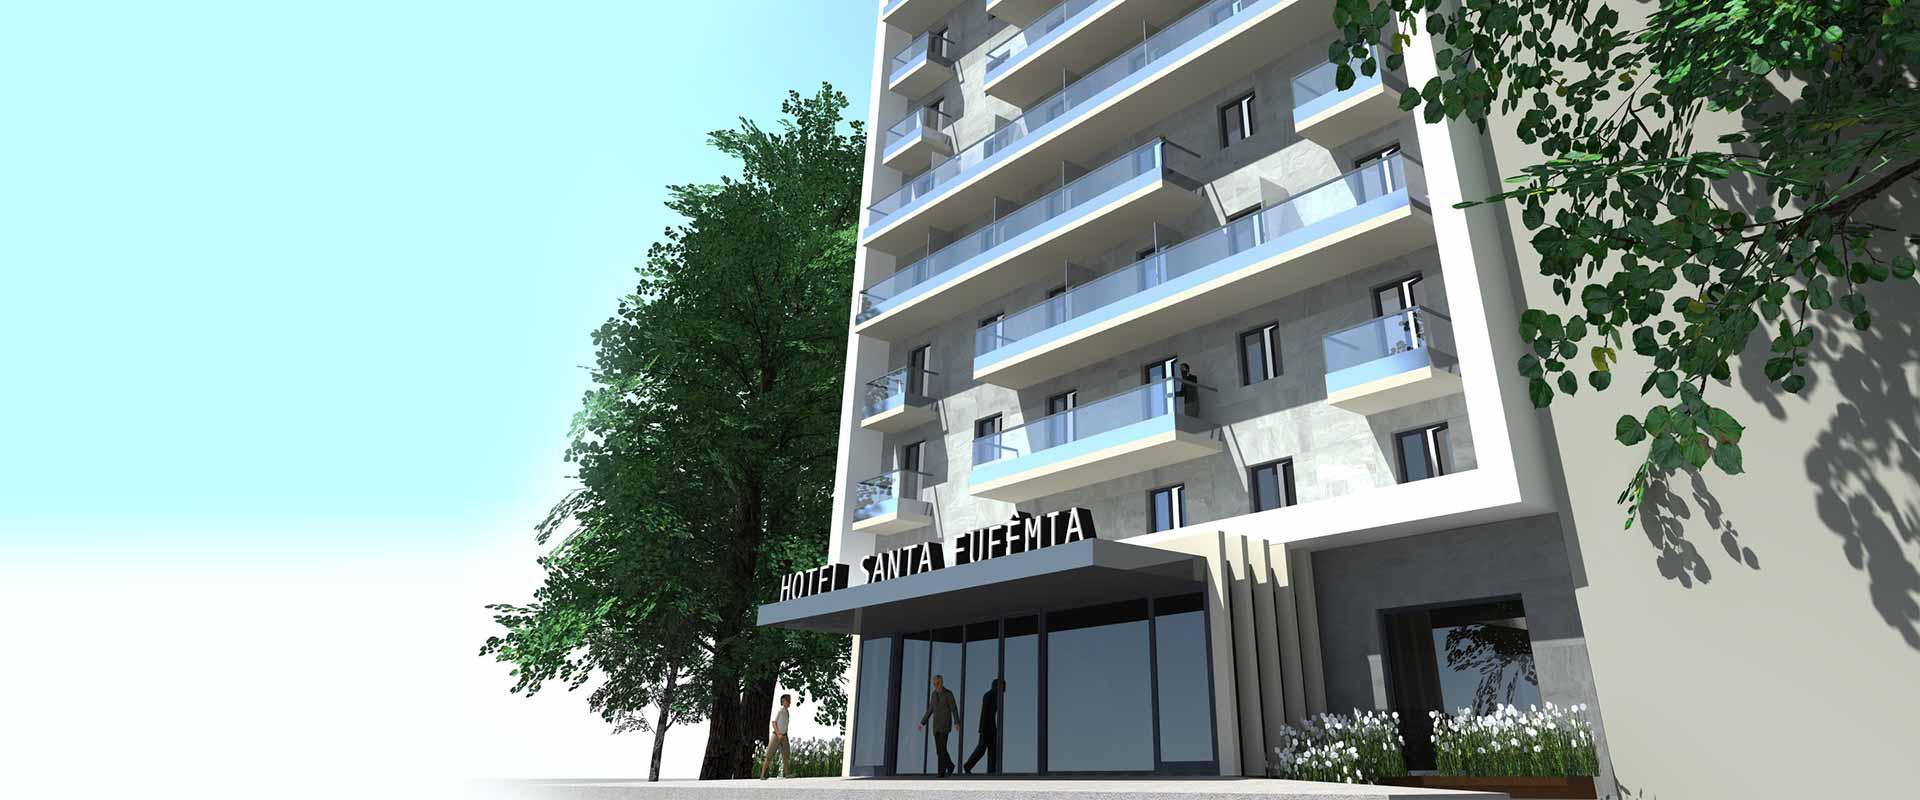 Hotel-Santa-Eufémia-RMPZ1.jpg